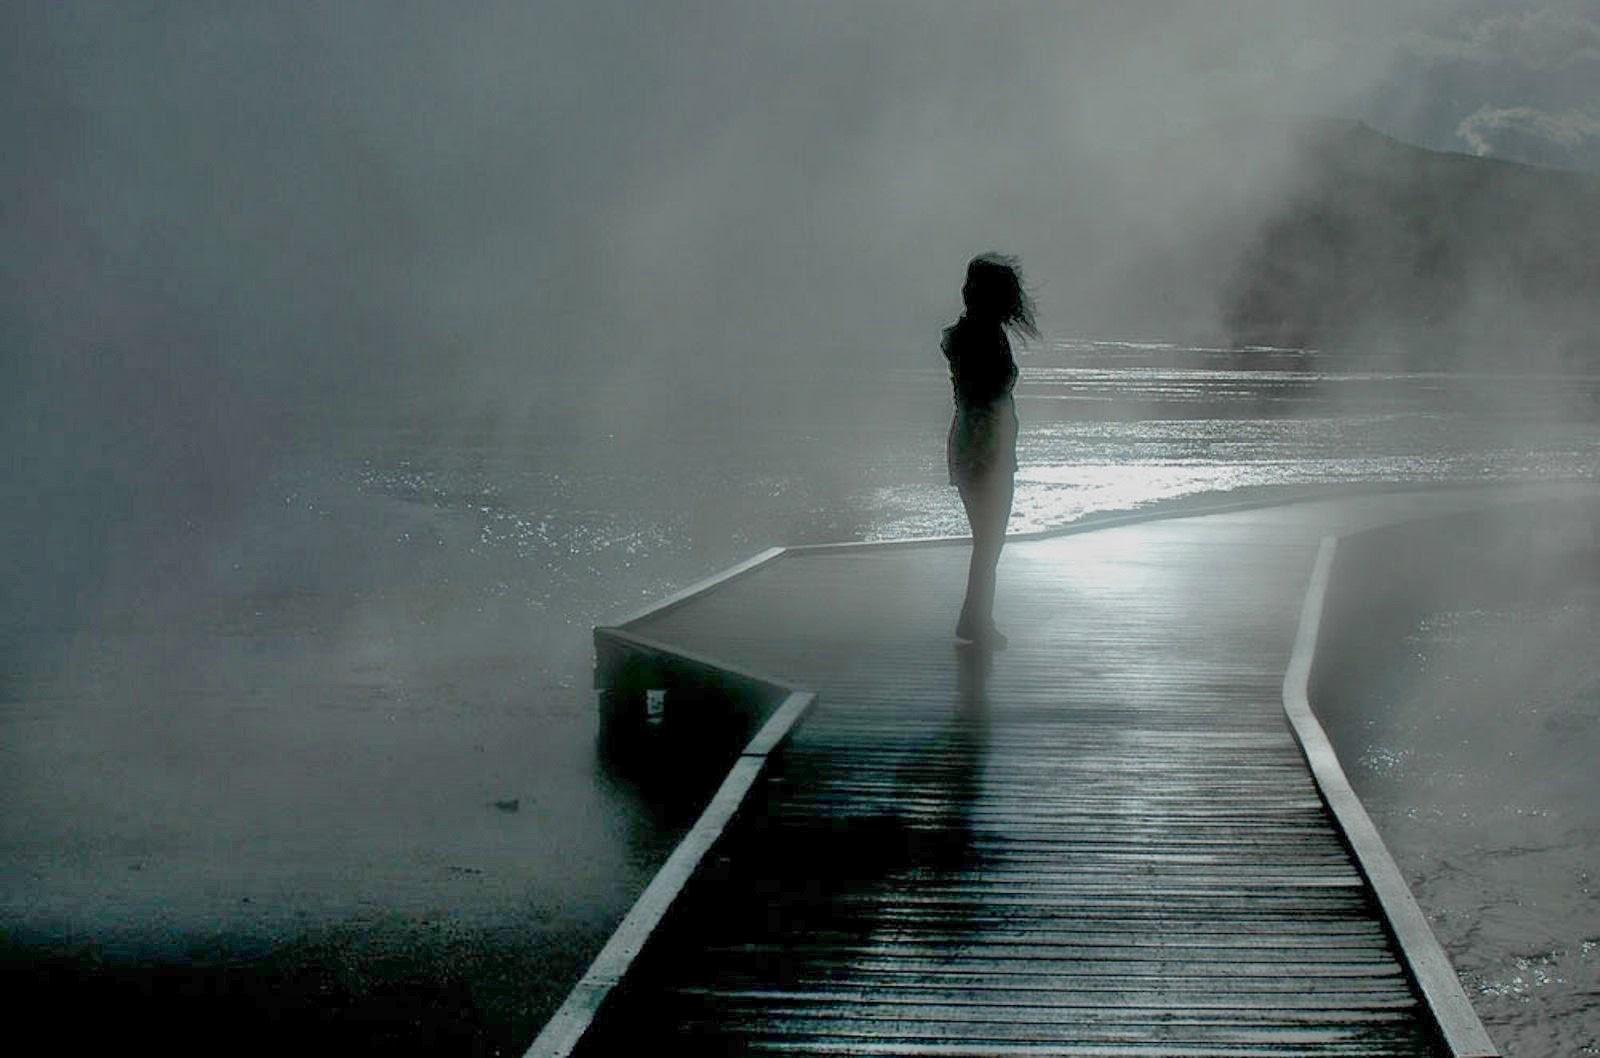 Beautiful Alone Girl Wallpapers - Broken Heart Lonely Broken Heart Sad Girls - HD Wallpaper